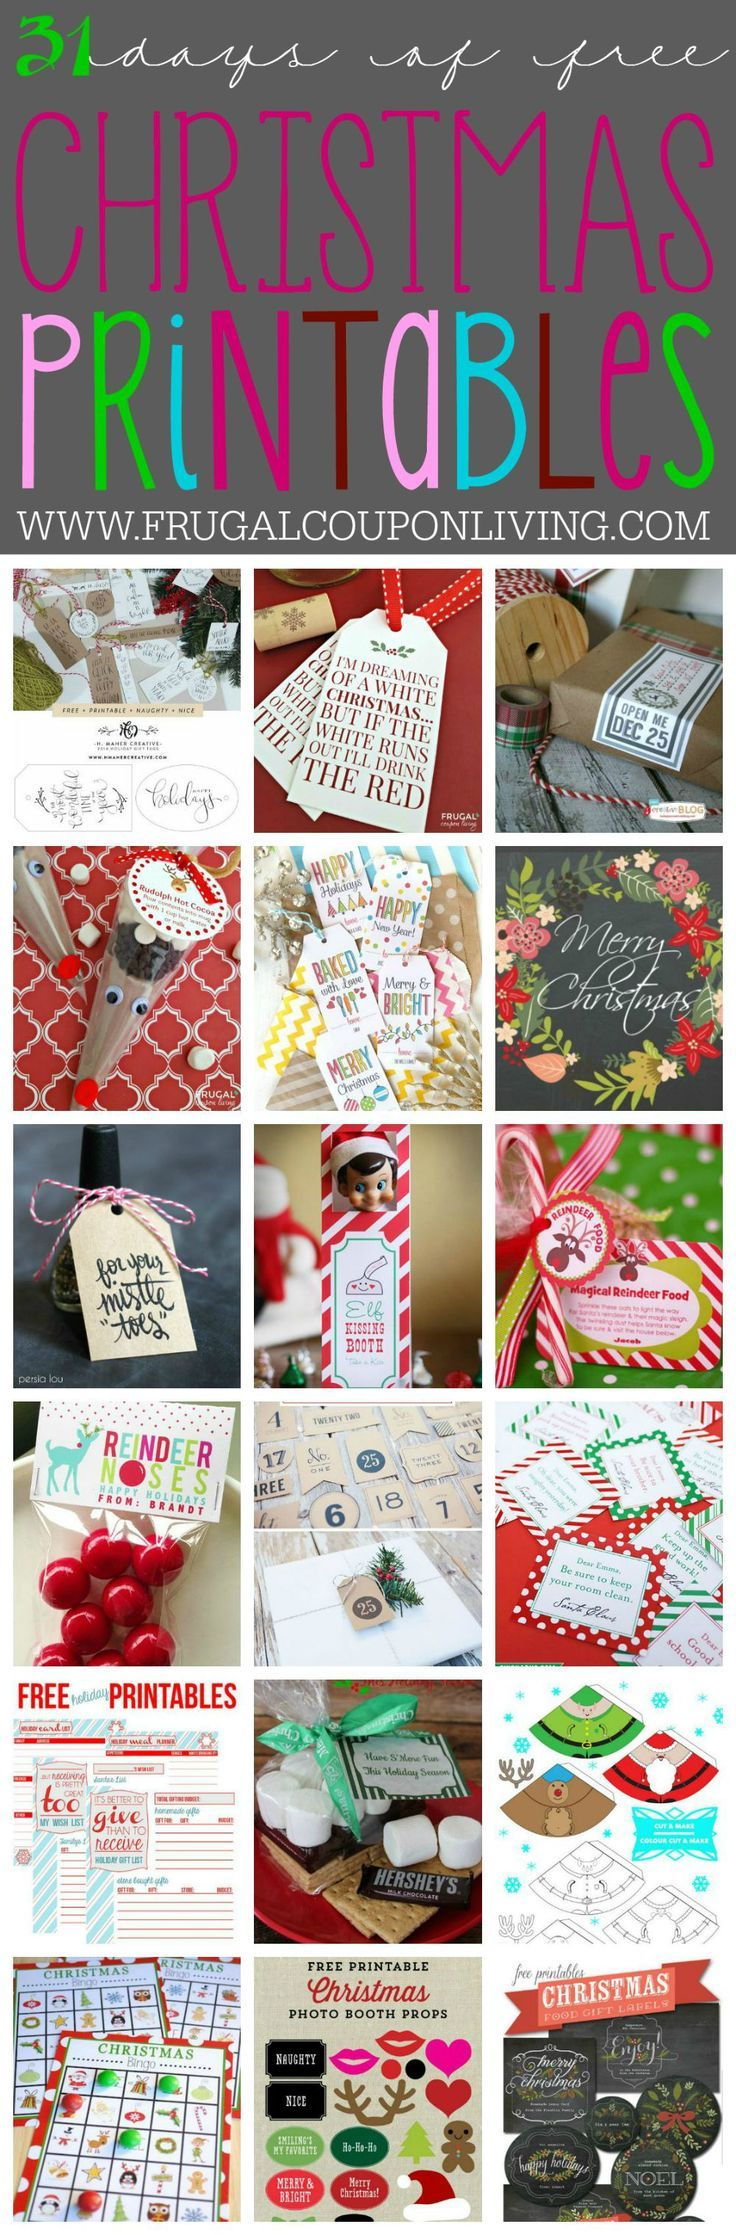 31 days of Free Christmas Printables on Frugal Coupon Living. You can jingle all…